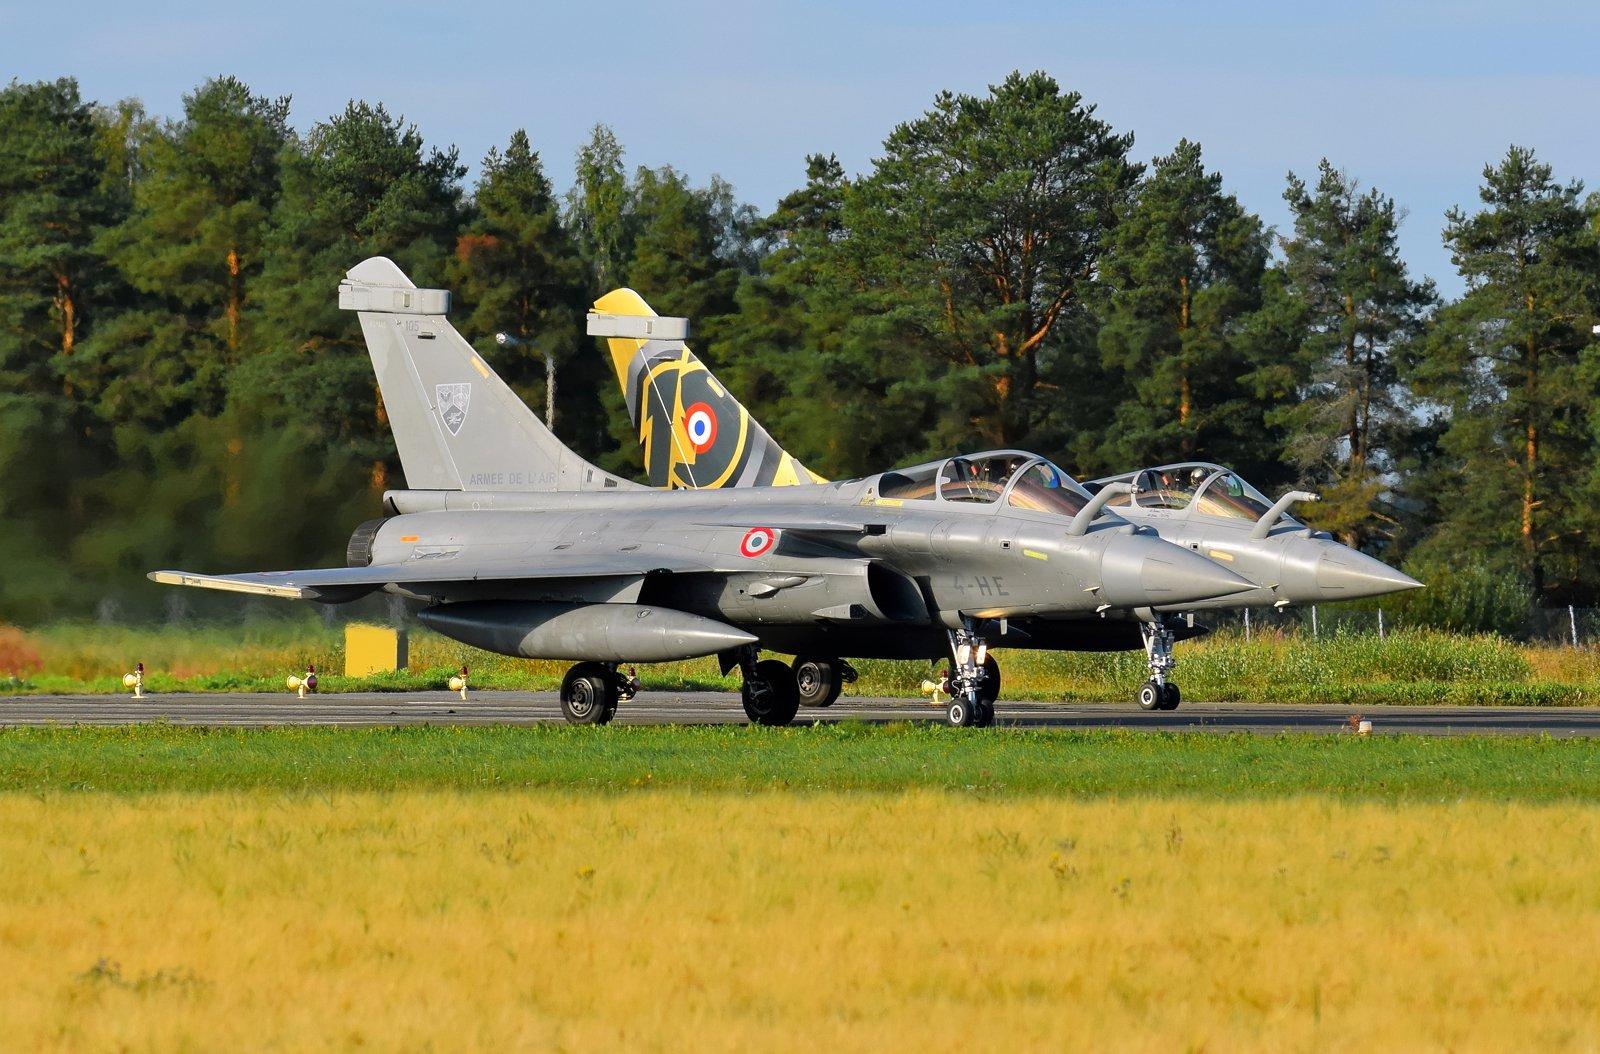 105 (takana 109) - Dassault Rafale C - Armee De L'Air (Ranskan ilmavoimat) - 31.8.2020